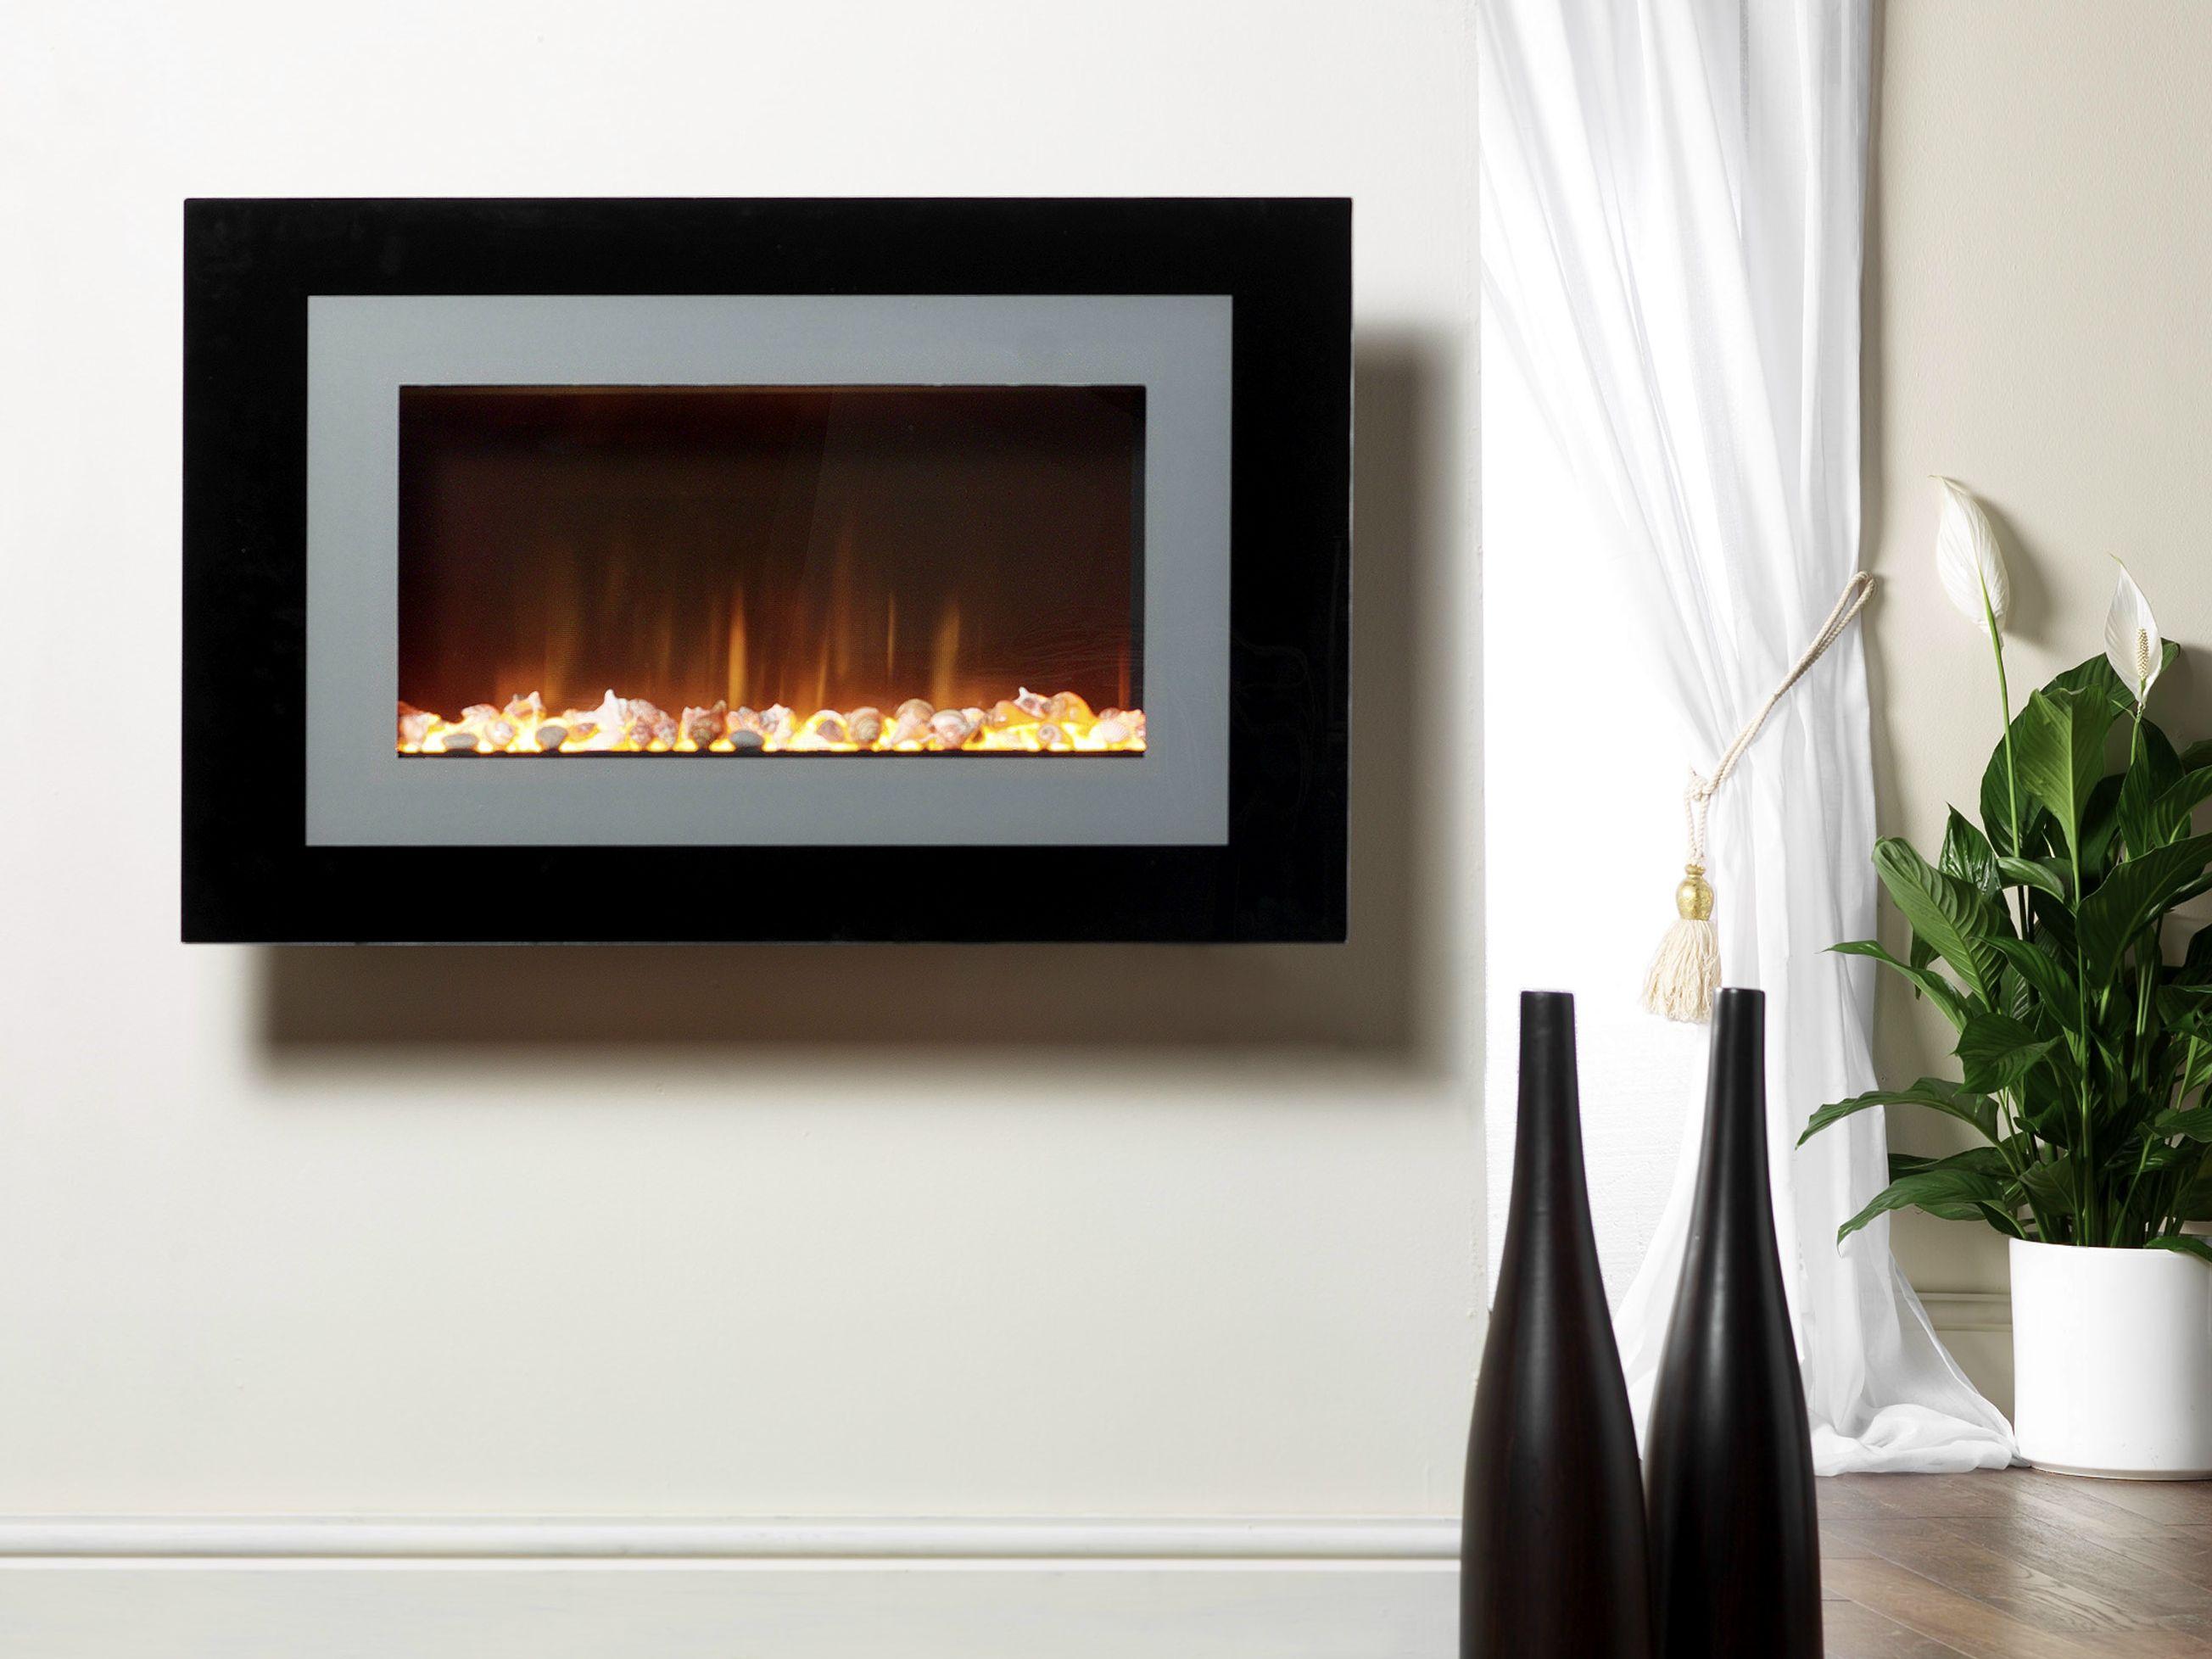 Chimenea el ctrica de pared ayston by british fires - Chimenea de pared ...